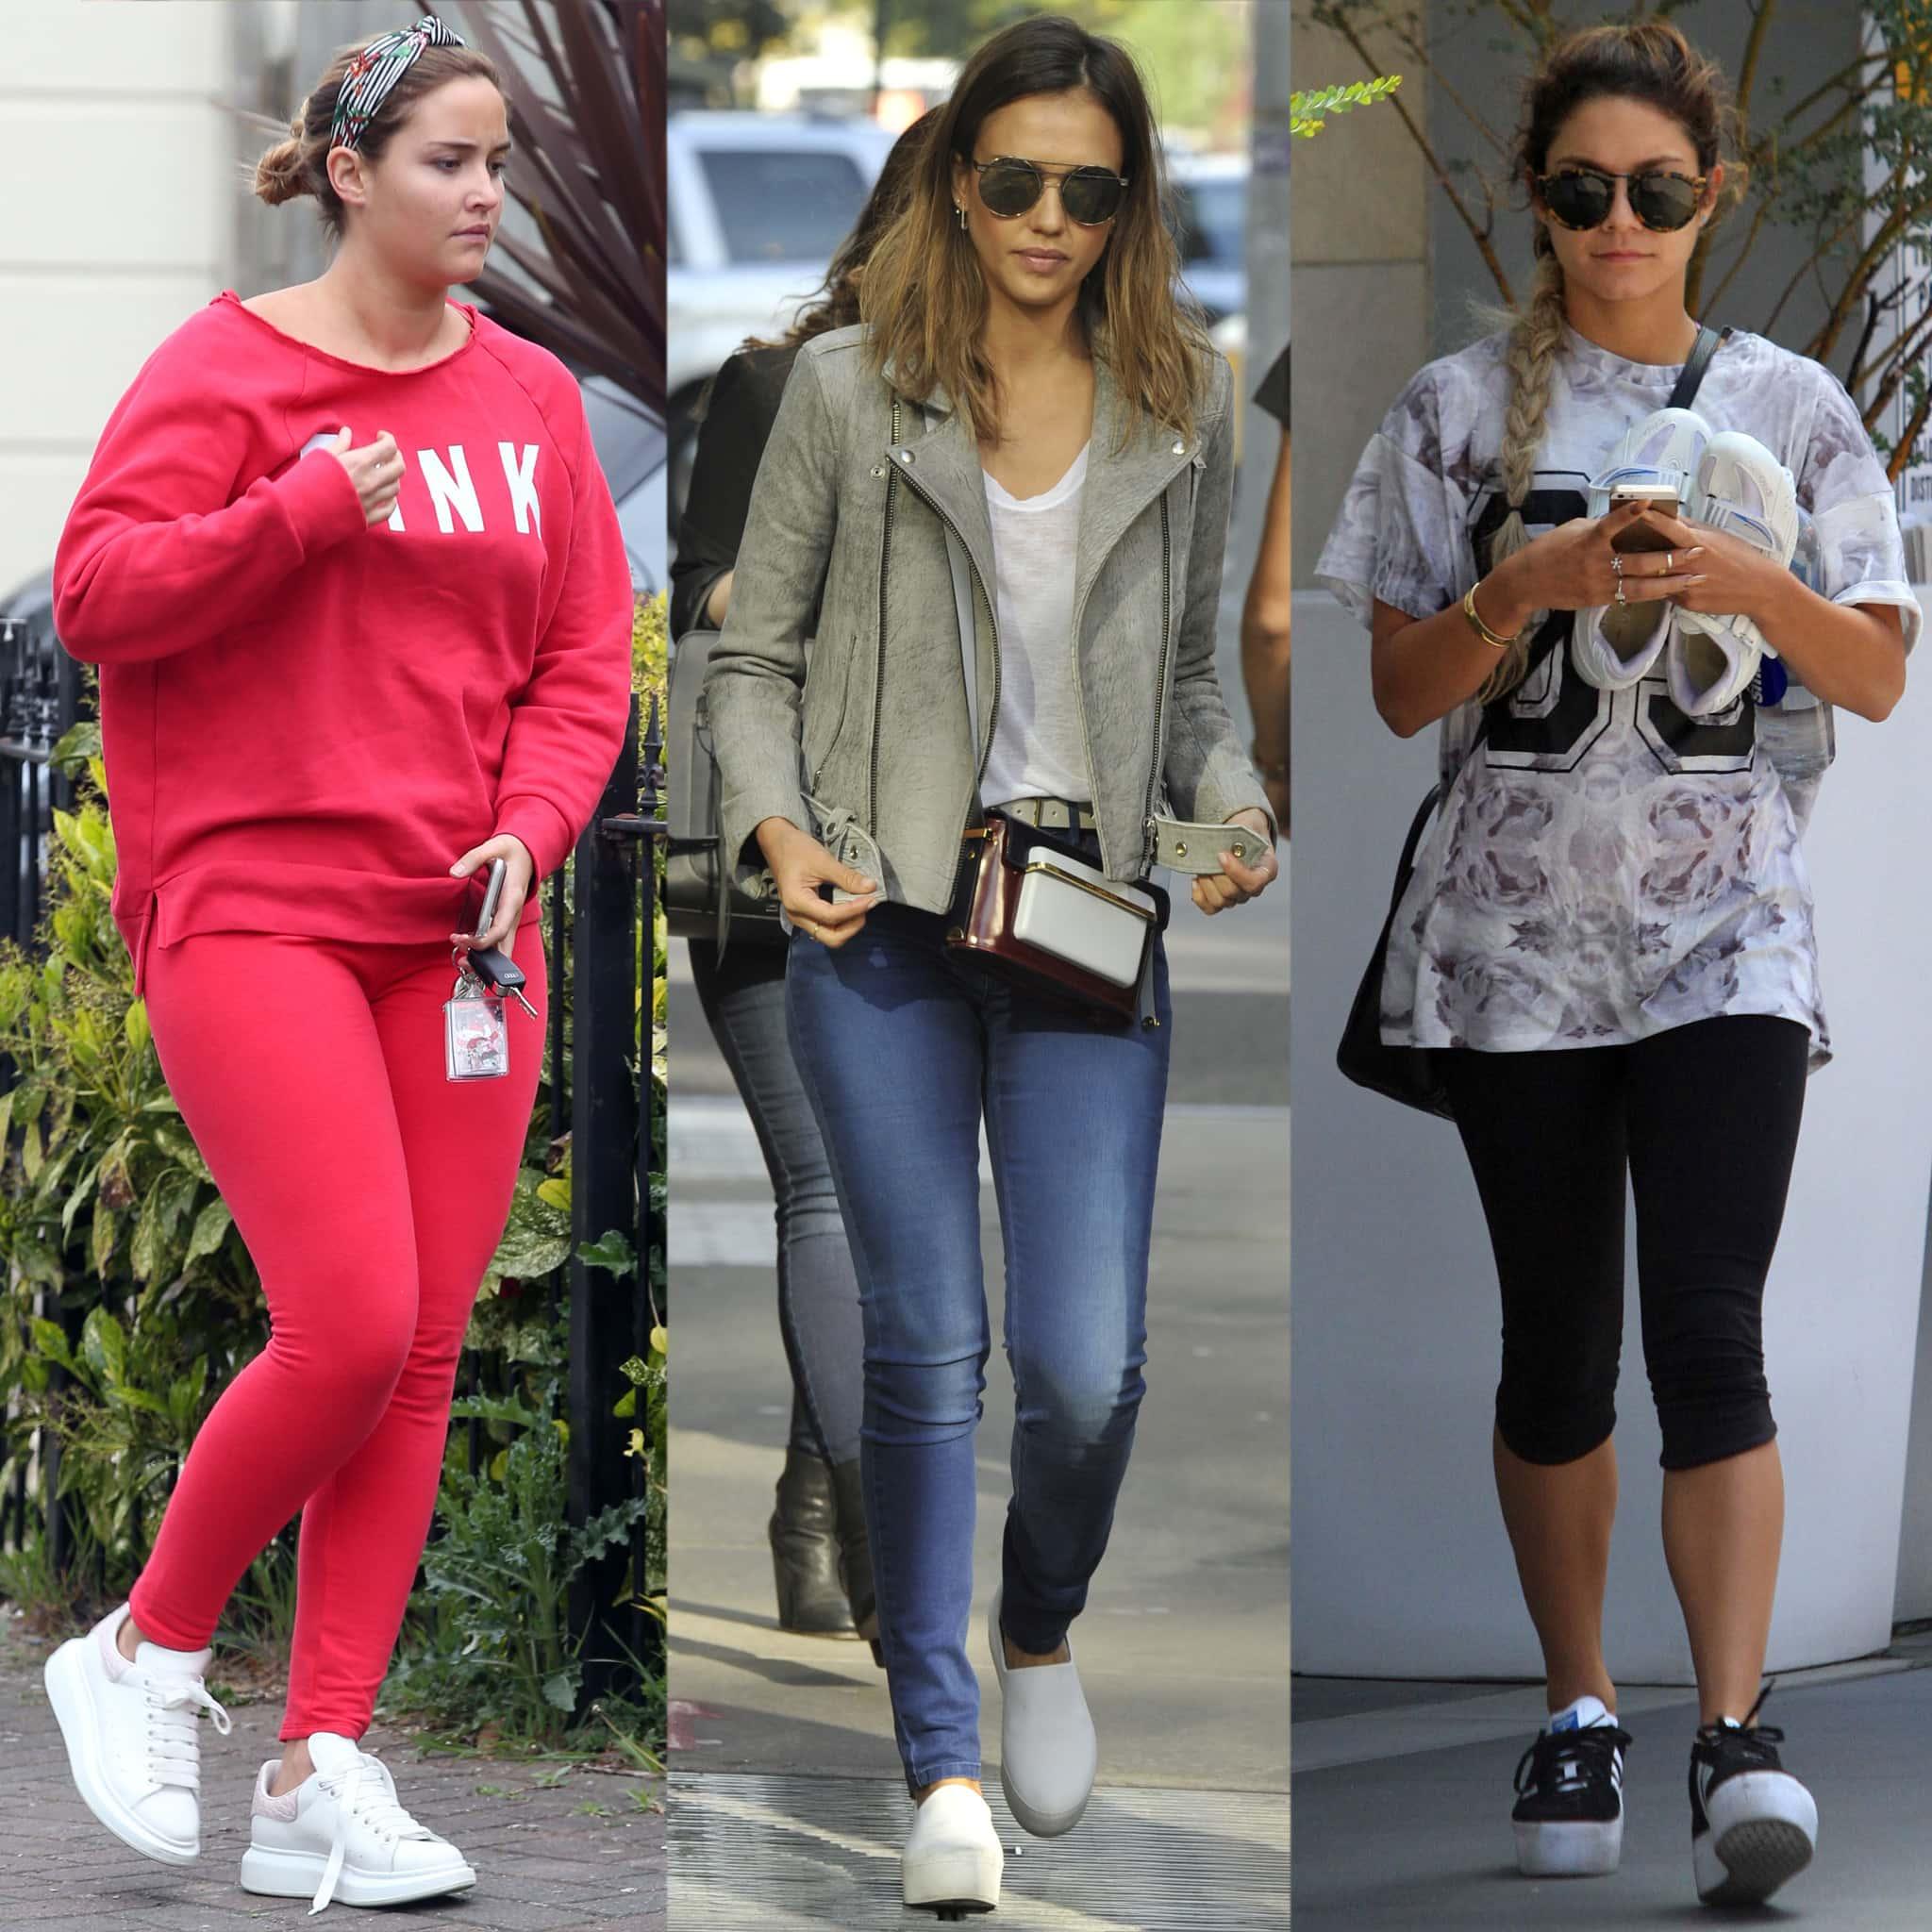 Jacqueline Jossa, Jessica Alba, and Vanessa Hudgens in comfy platform sneakers